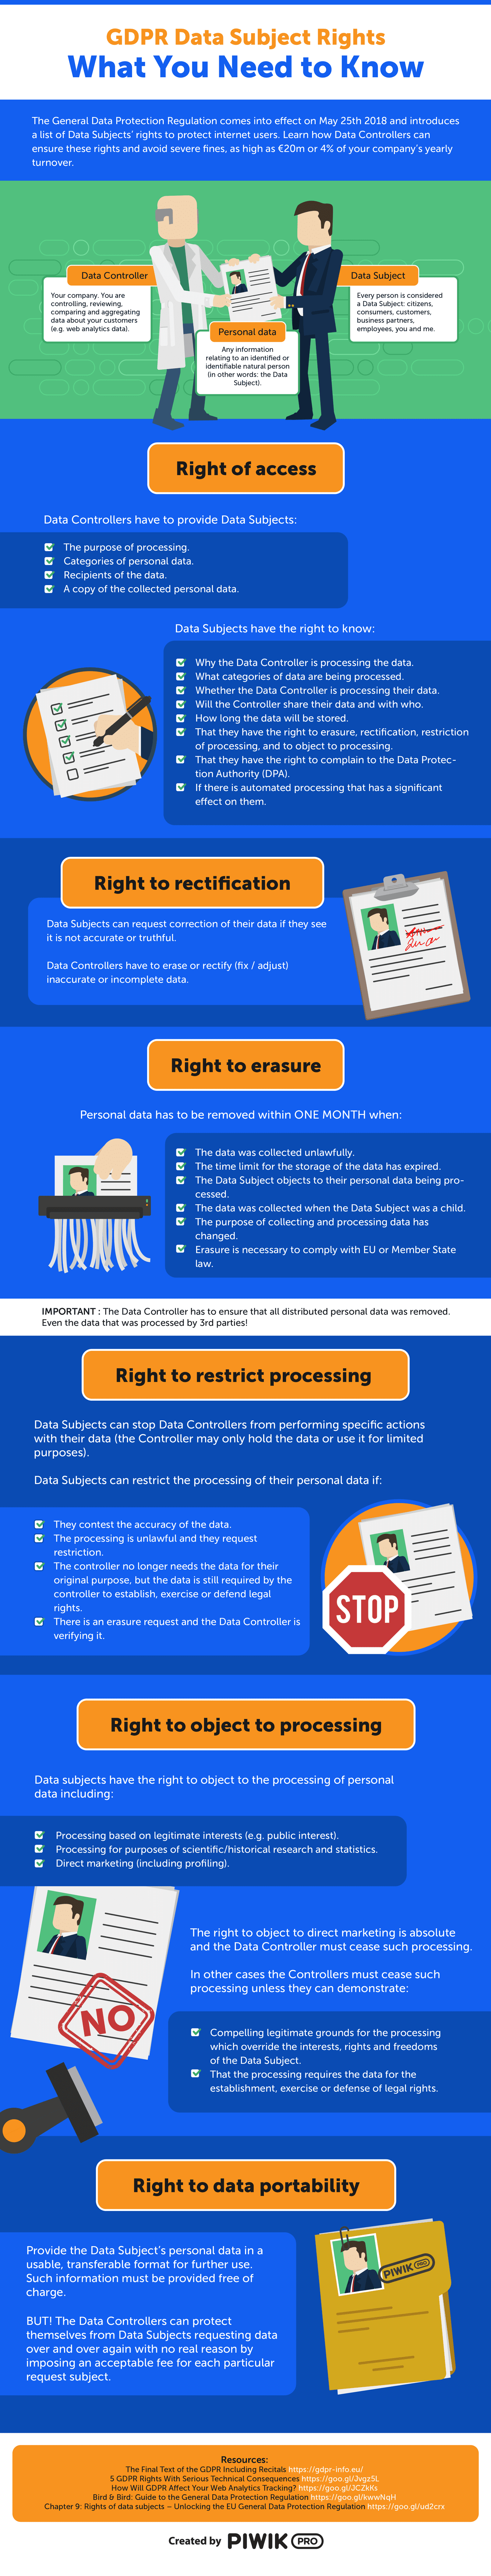 Data-Subject-Rights-Under-GDPR-Piwik-PRO